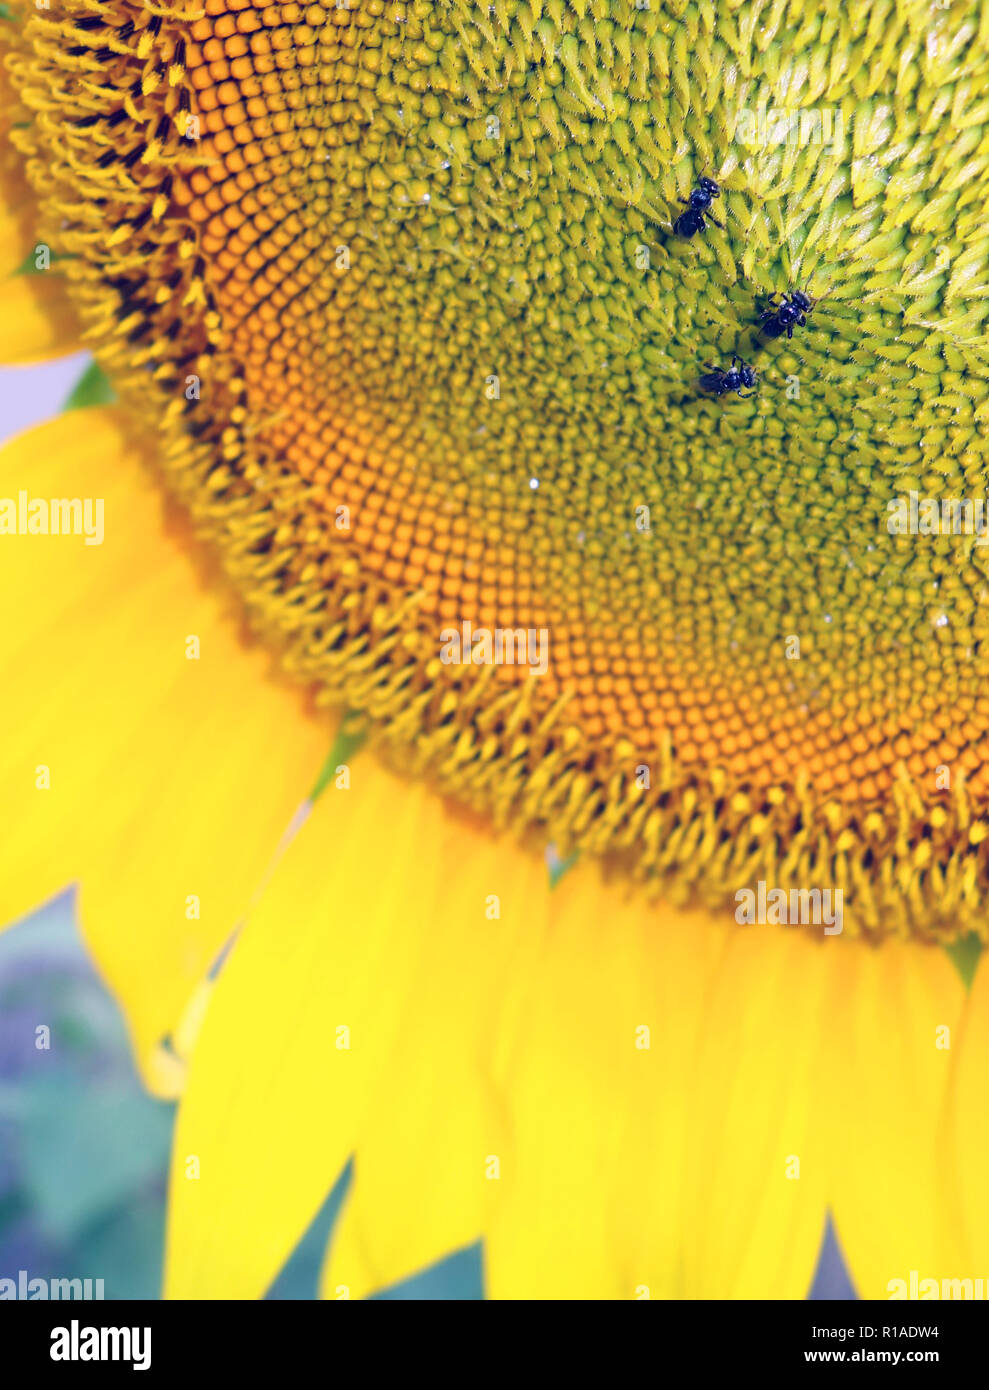 Tiny Australian native stingless bees on sunflower - Stock Image